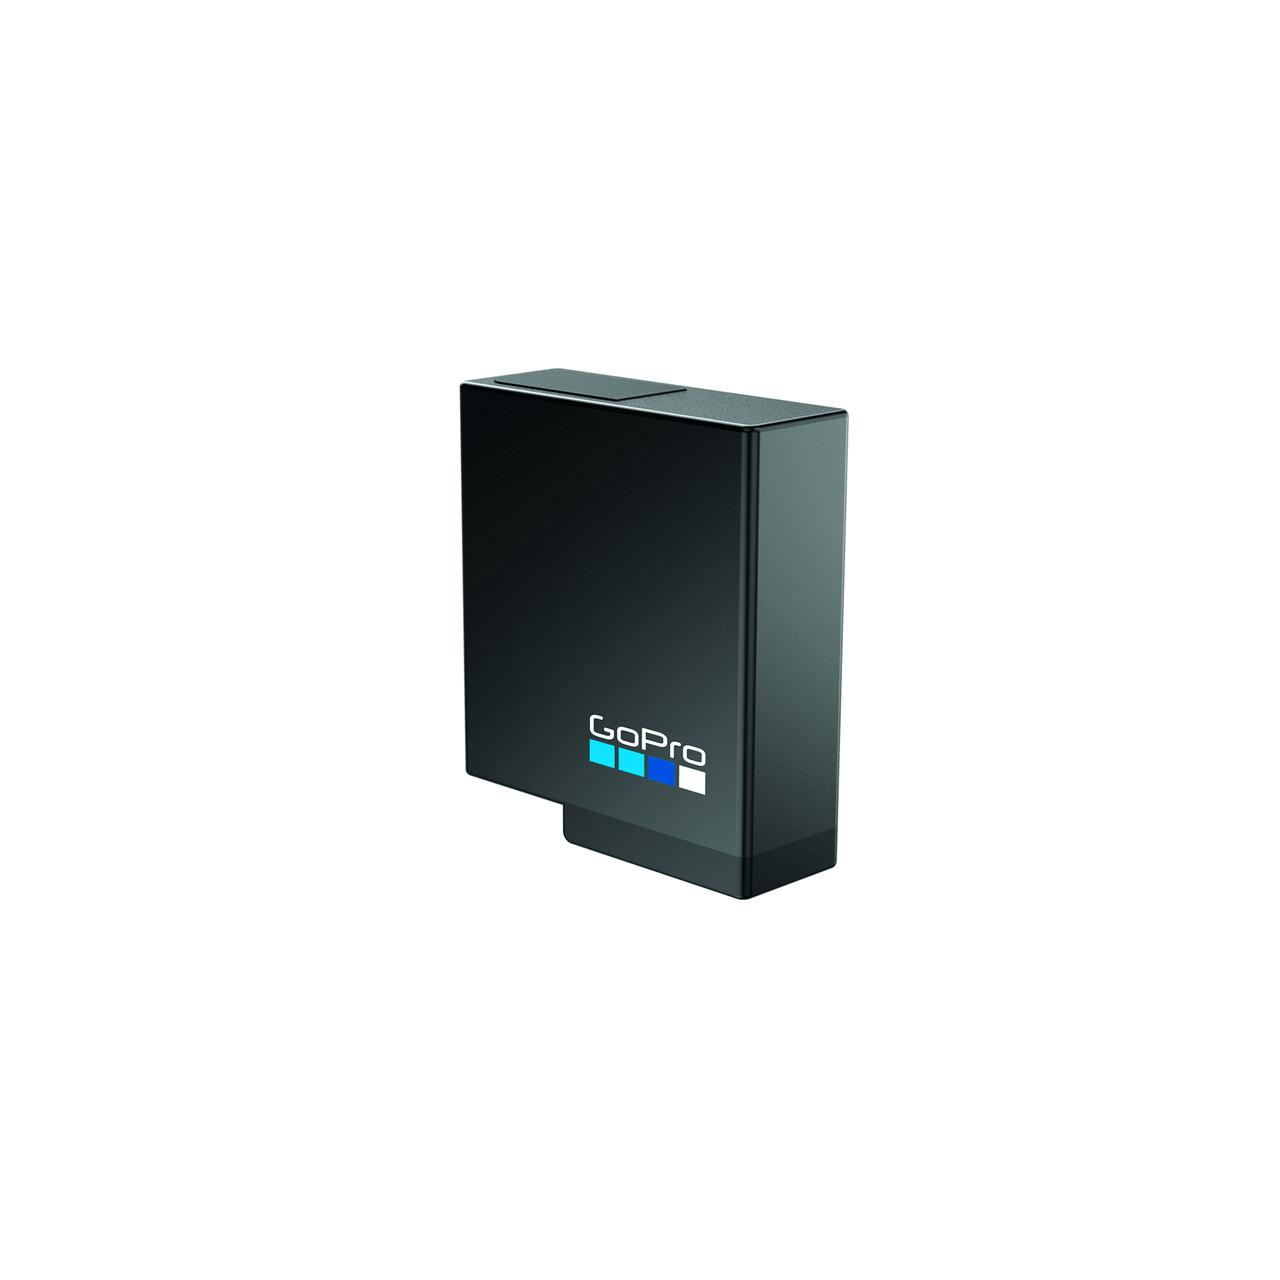 Аккумулятор для GoPro Hero 5/Hero 6 /Hero 7  1220 mAh Rechargeable Battery (оригинал)